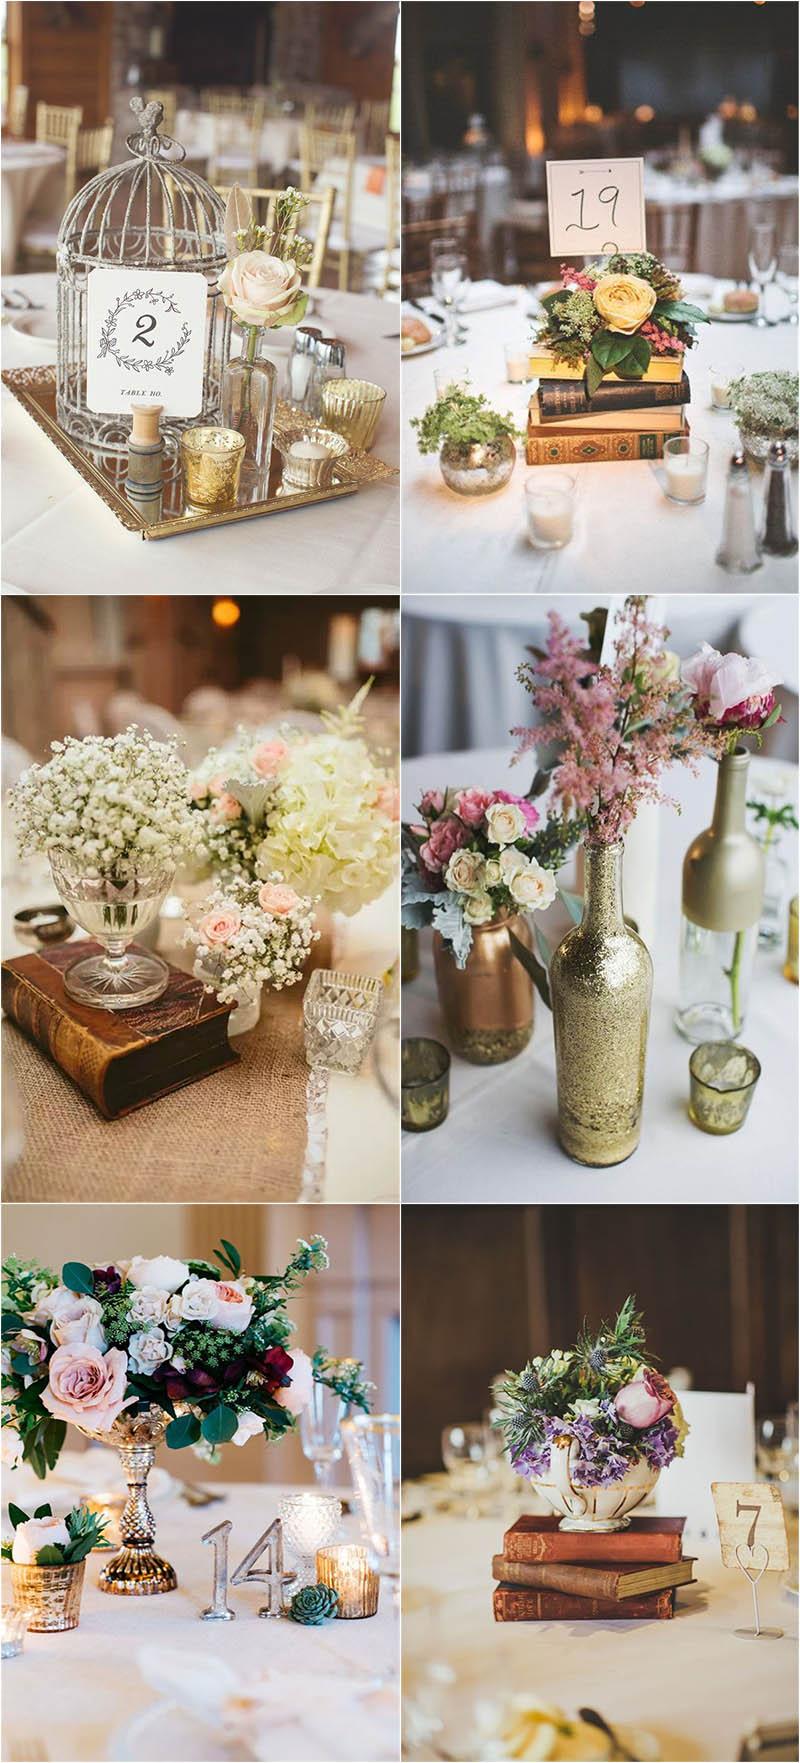 elegant and vintage wedding centerpieces